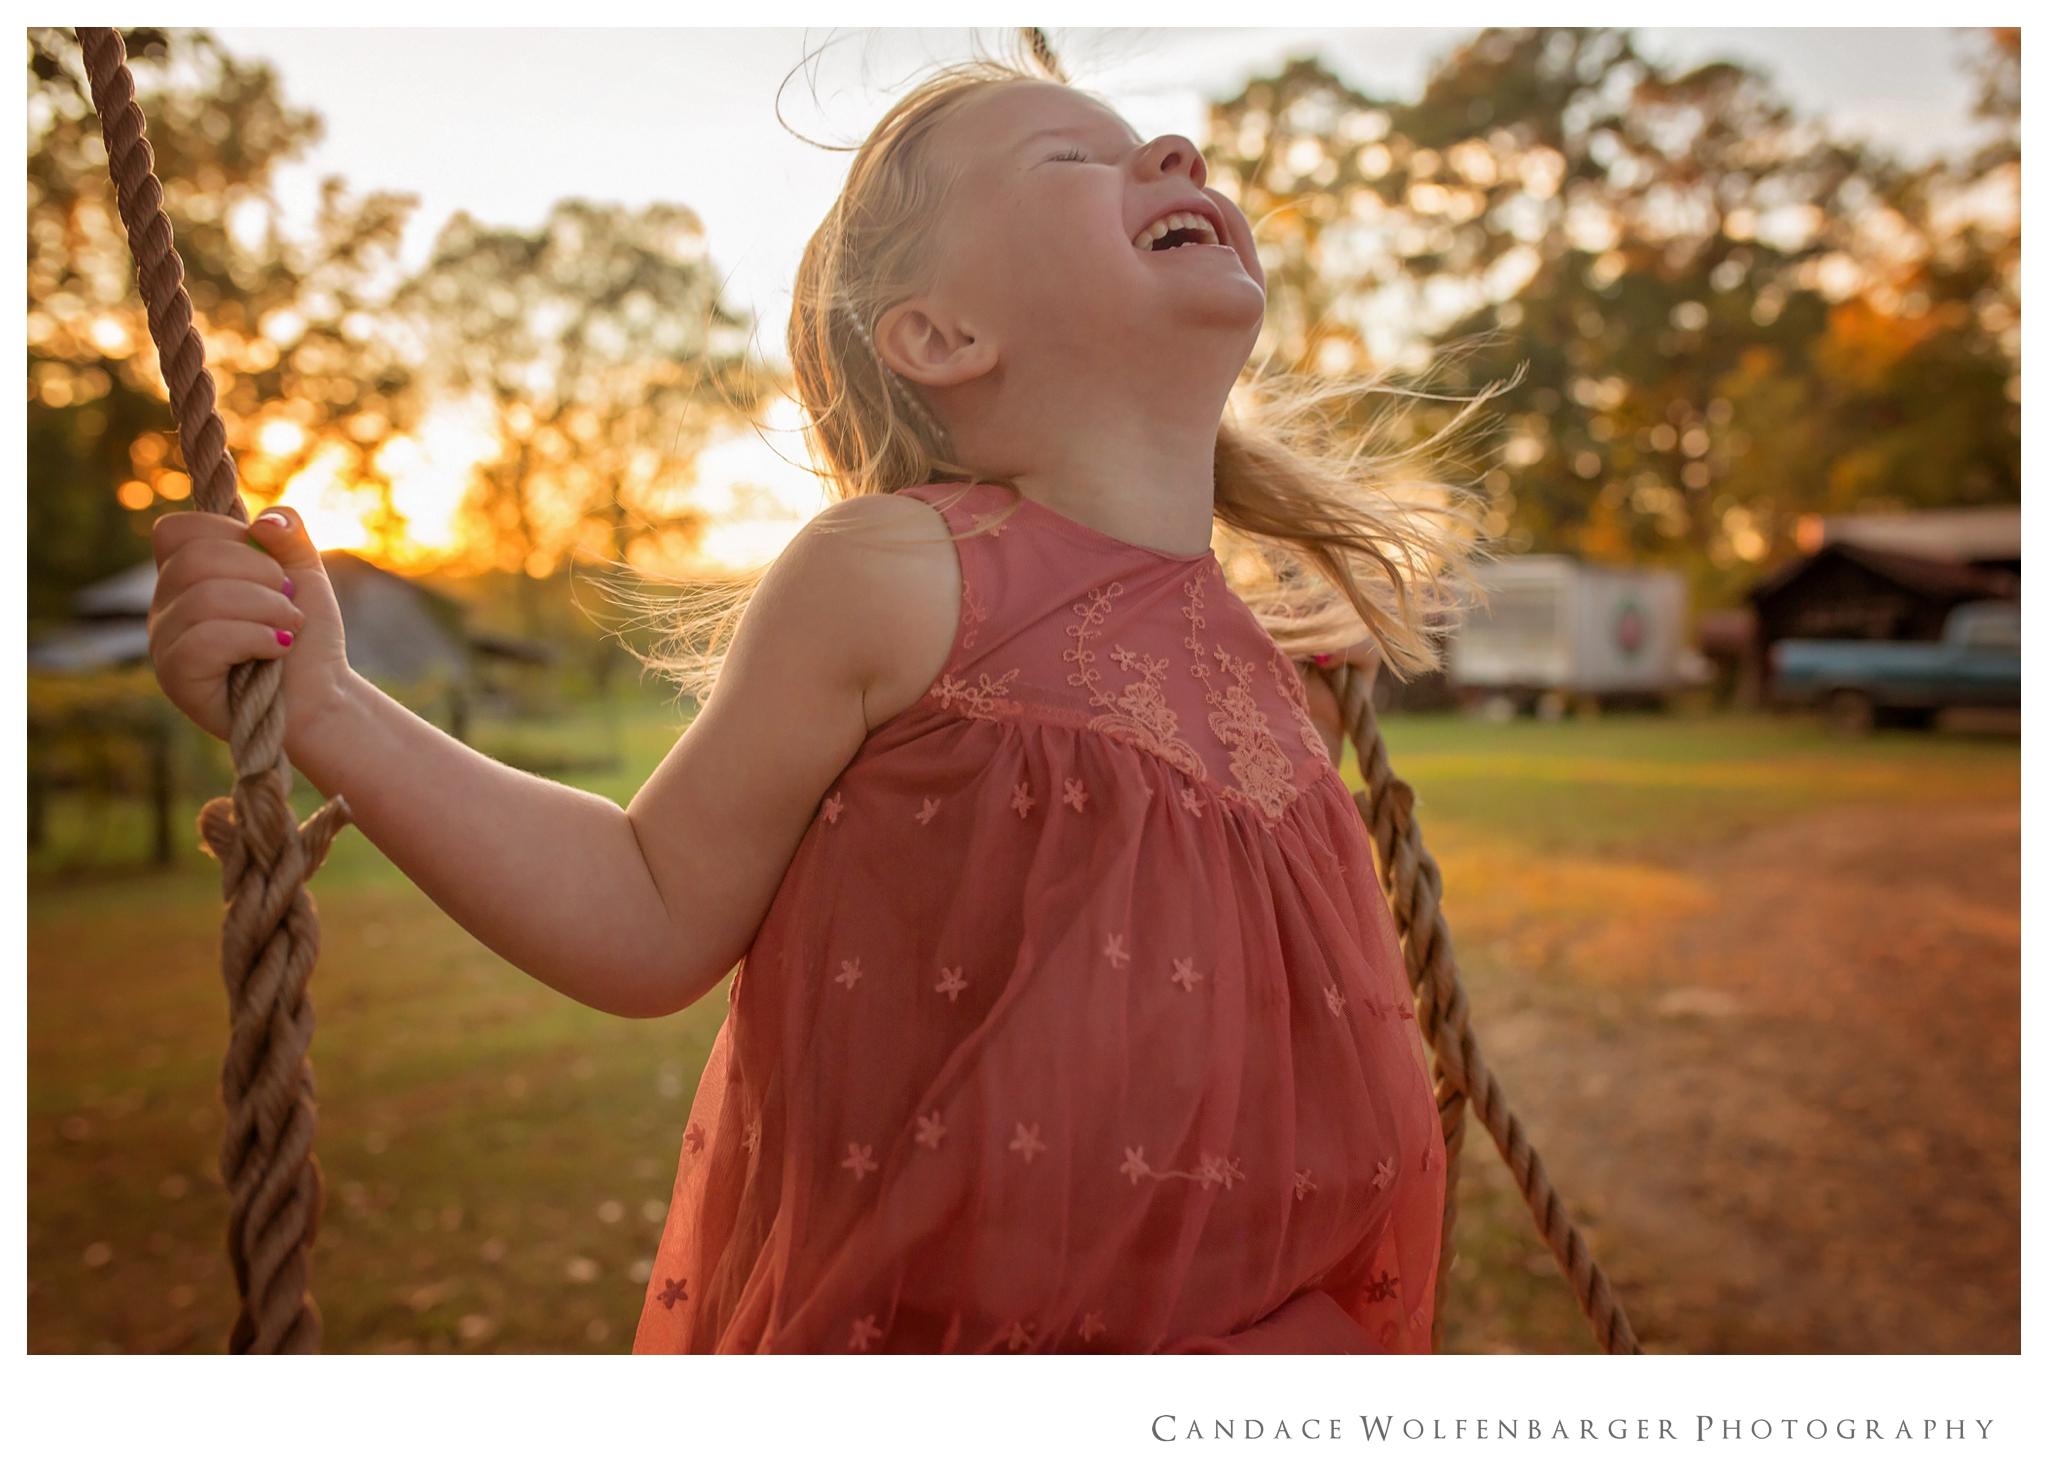 Naaman Caroline Swing Session Candace Wolfenbarger Sanford NC Childrens Photographer 13.jpg